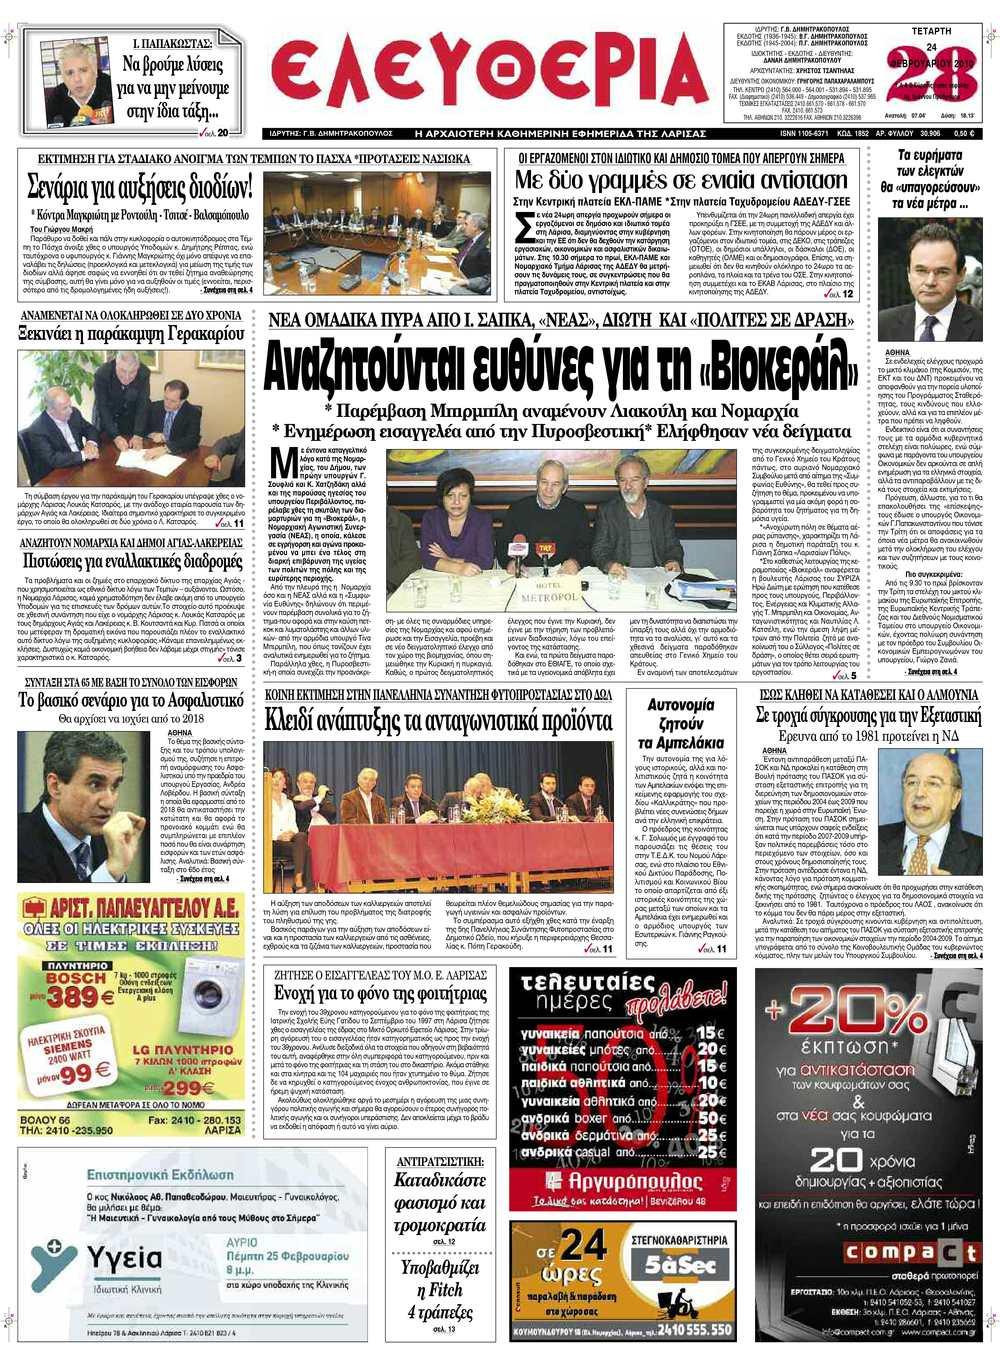 Calaméo - Eleftheria.gr 24 2 2010 3150d24ec2f